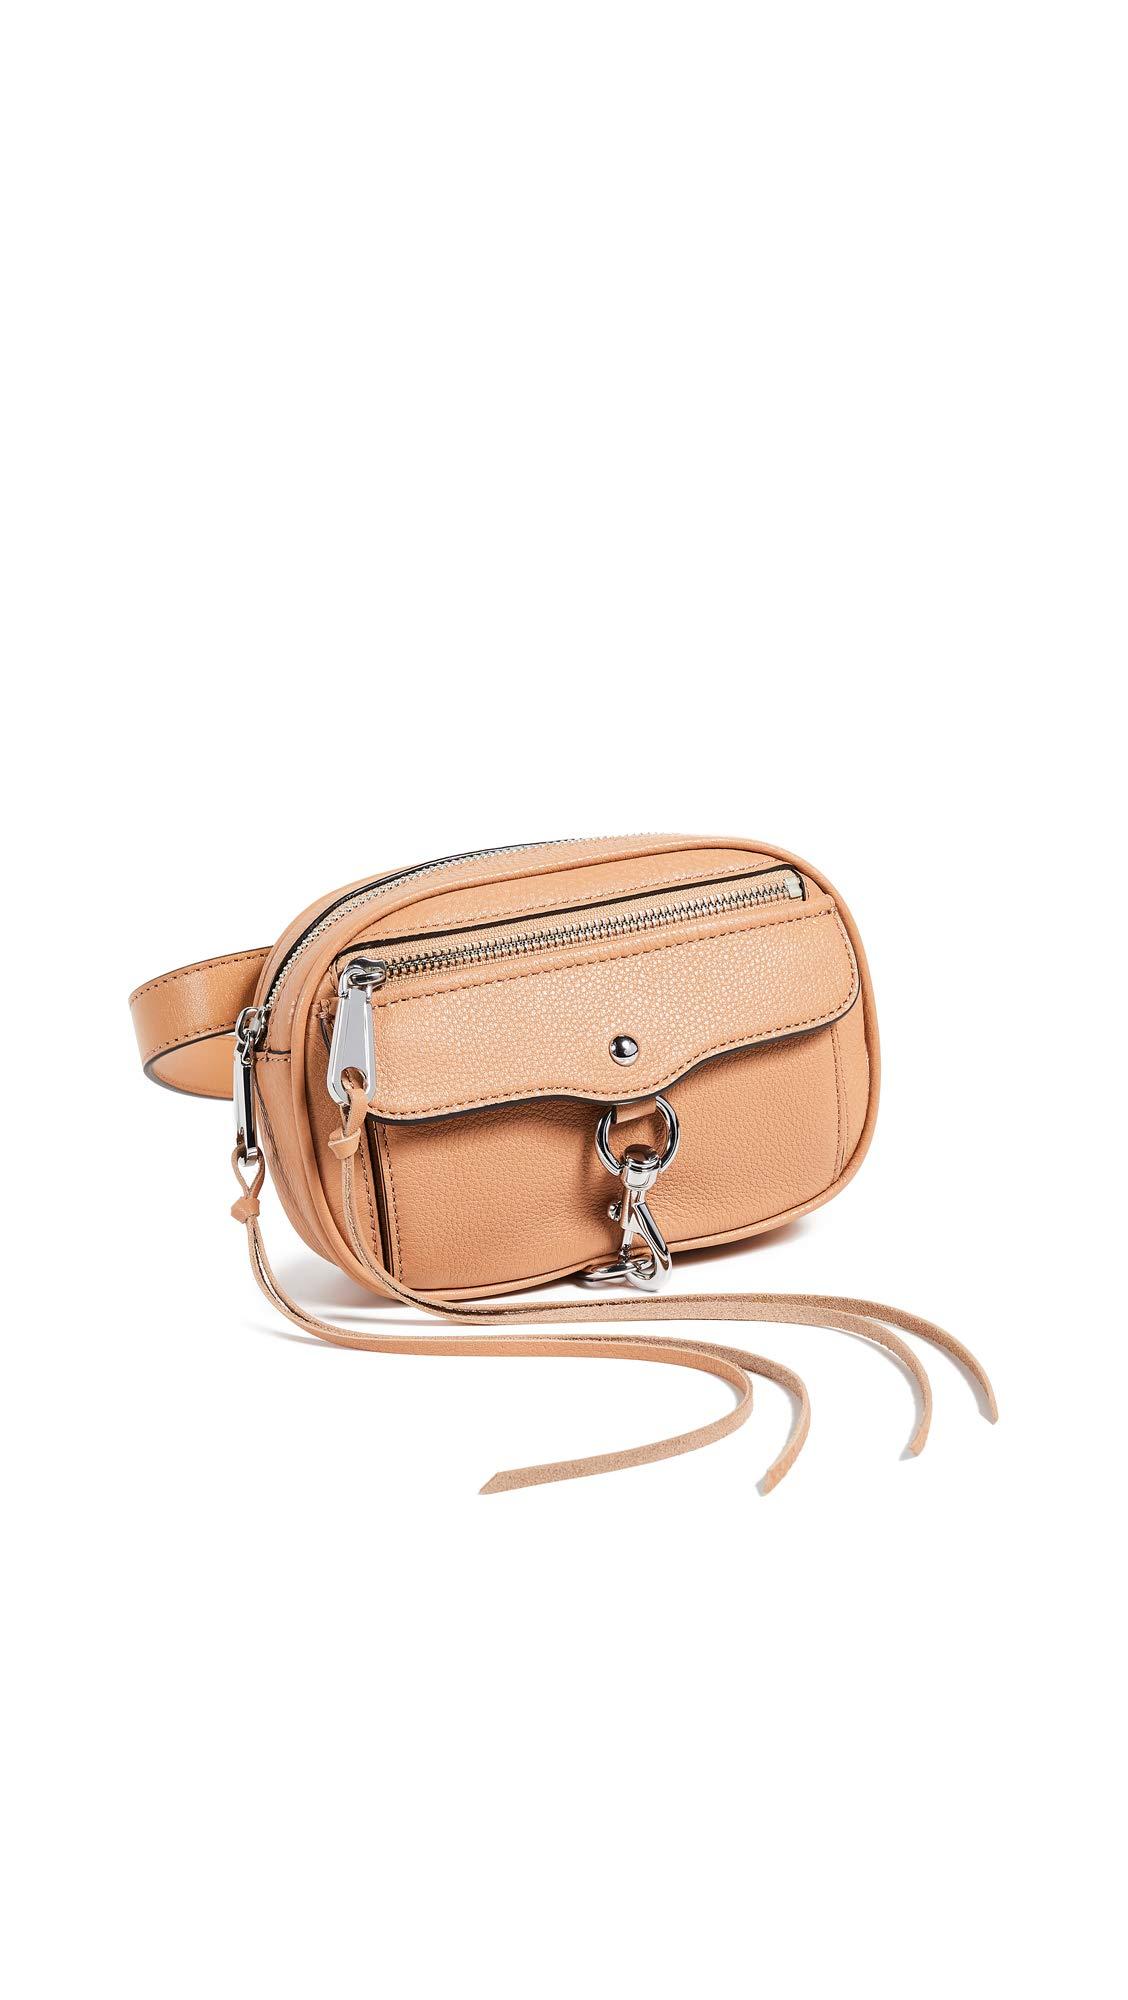 Rebecca Minkoff Women's Blythe Belt Bag, Honey, Tan, One Size